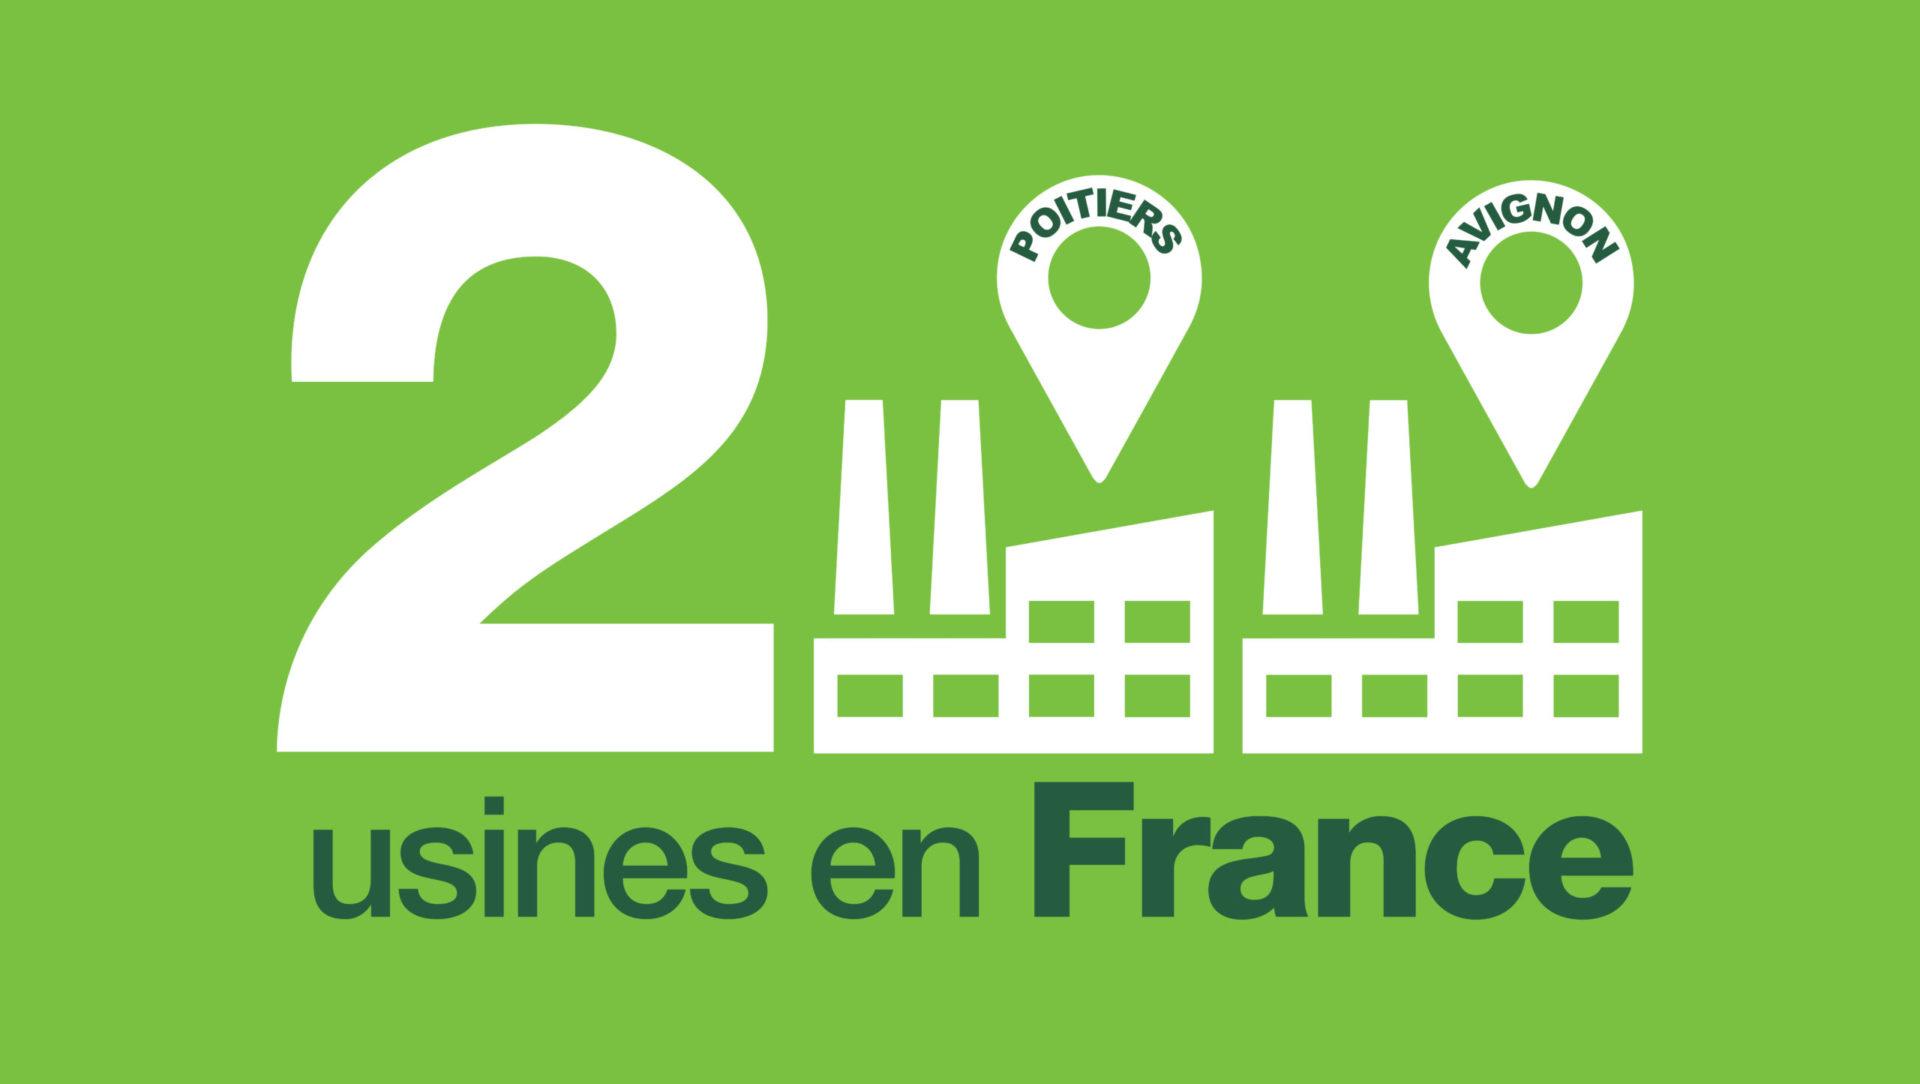 Deux usines en France